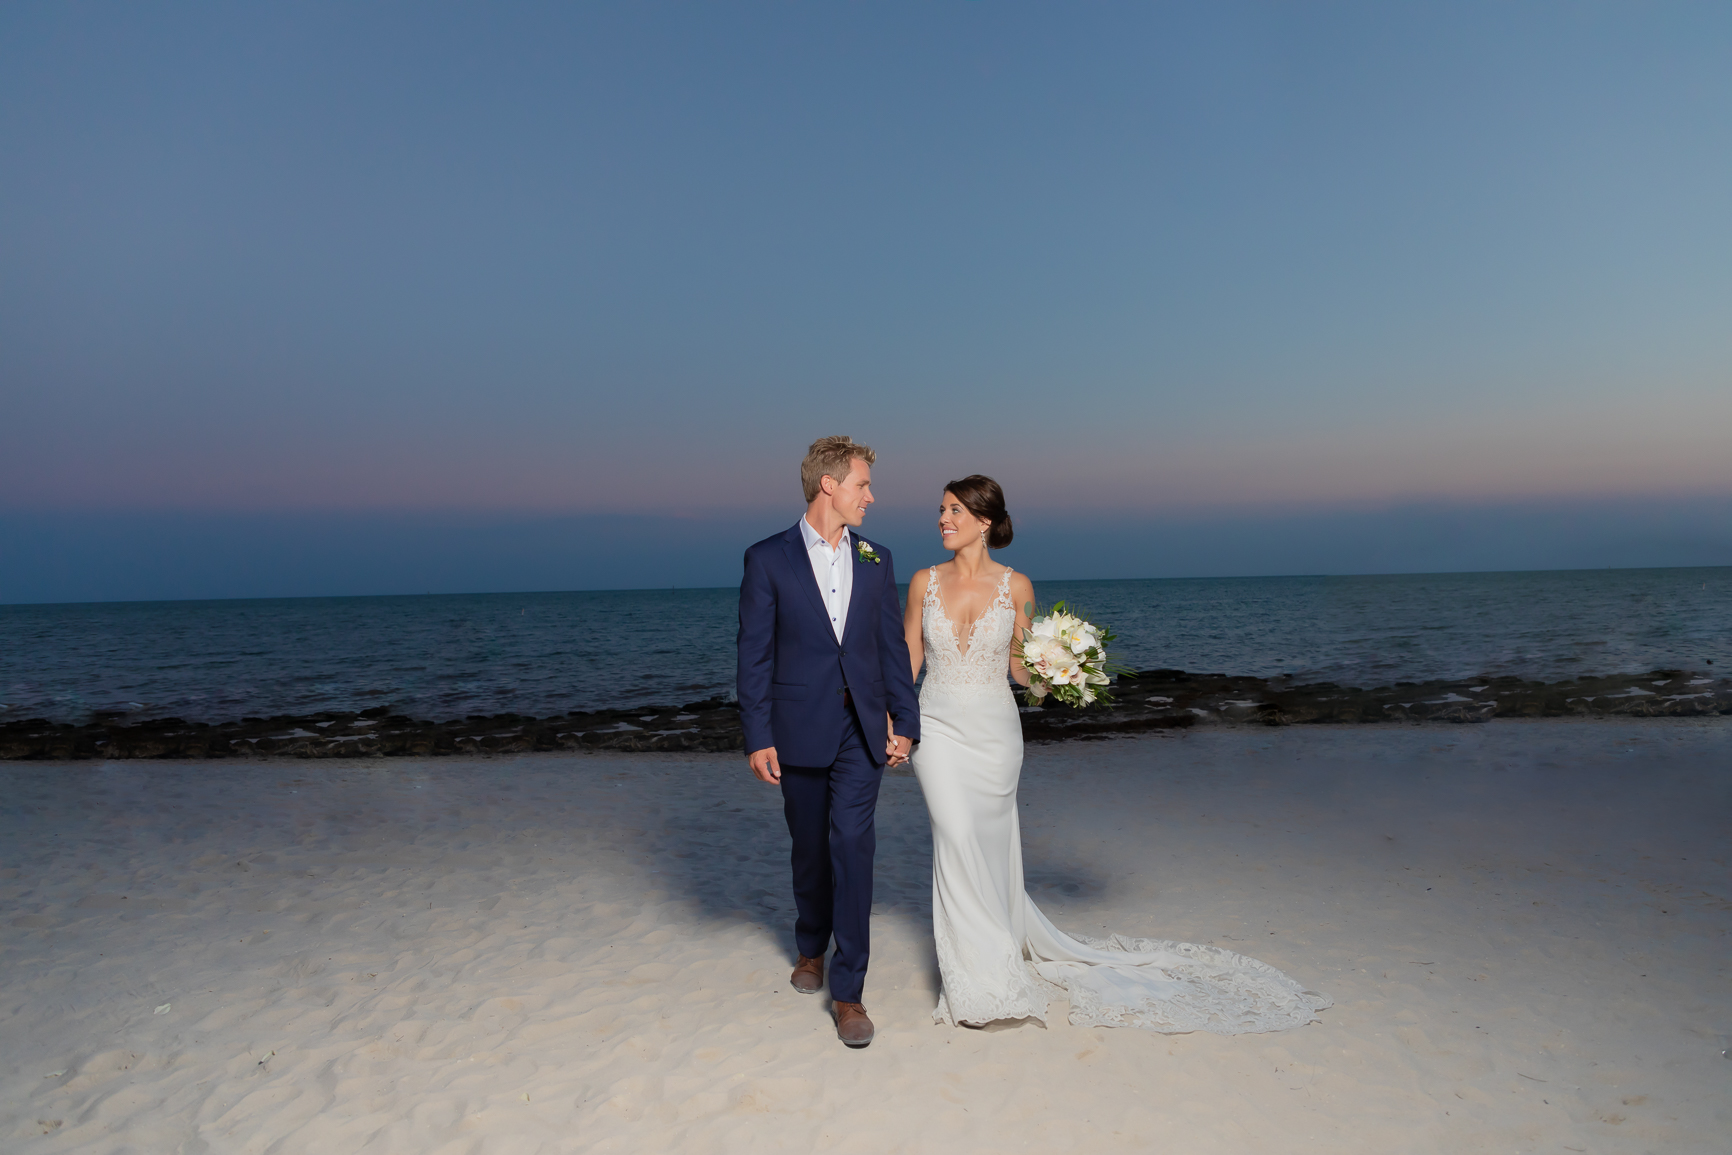 KKey West Wedding Casa Marina - Key West Wedding Photographer